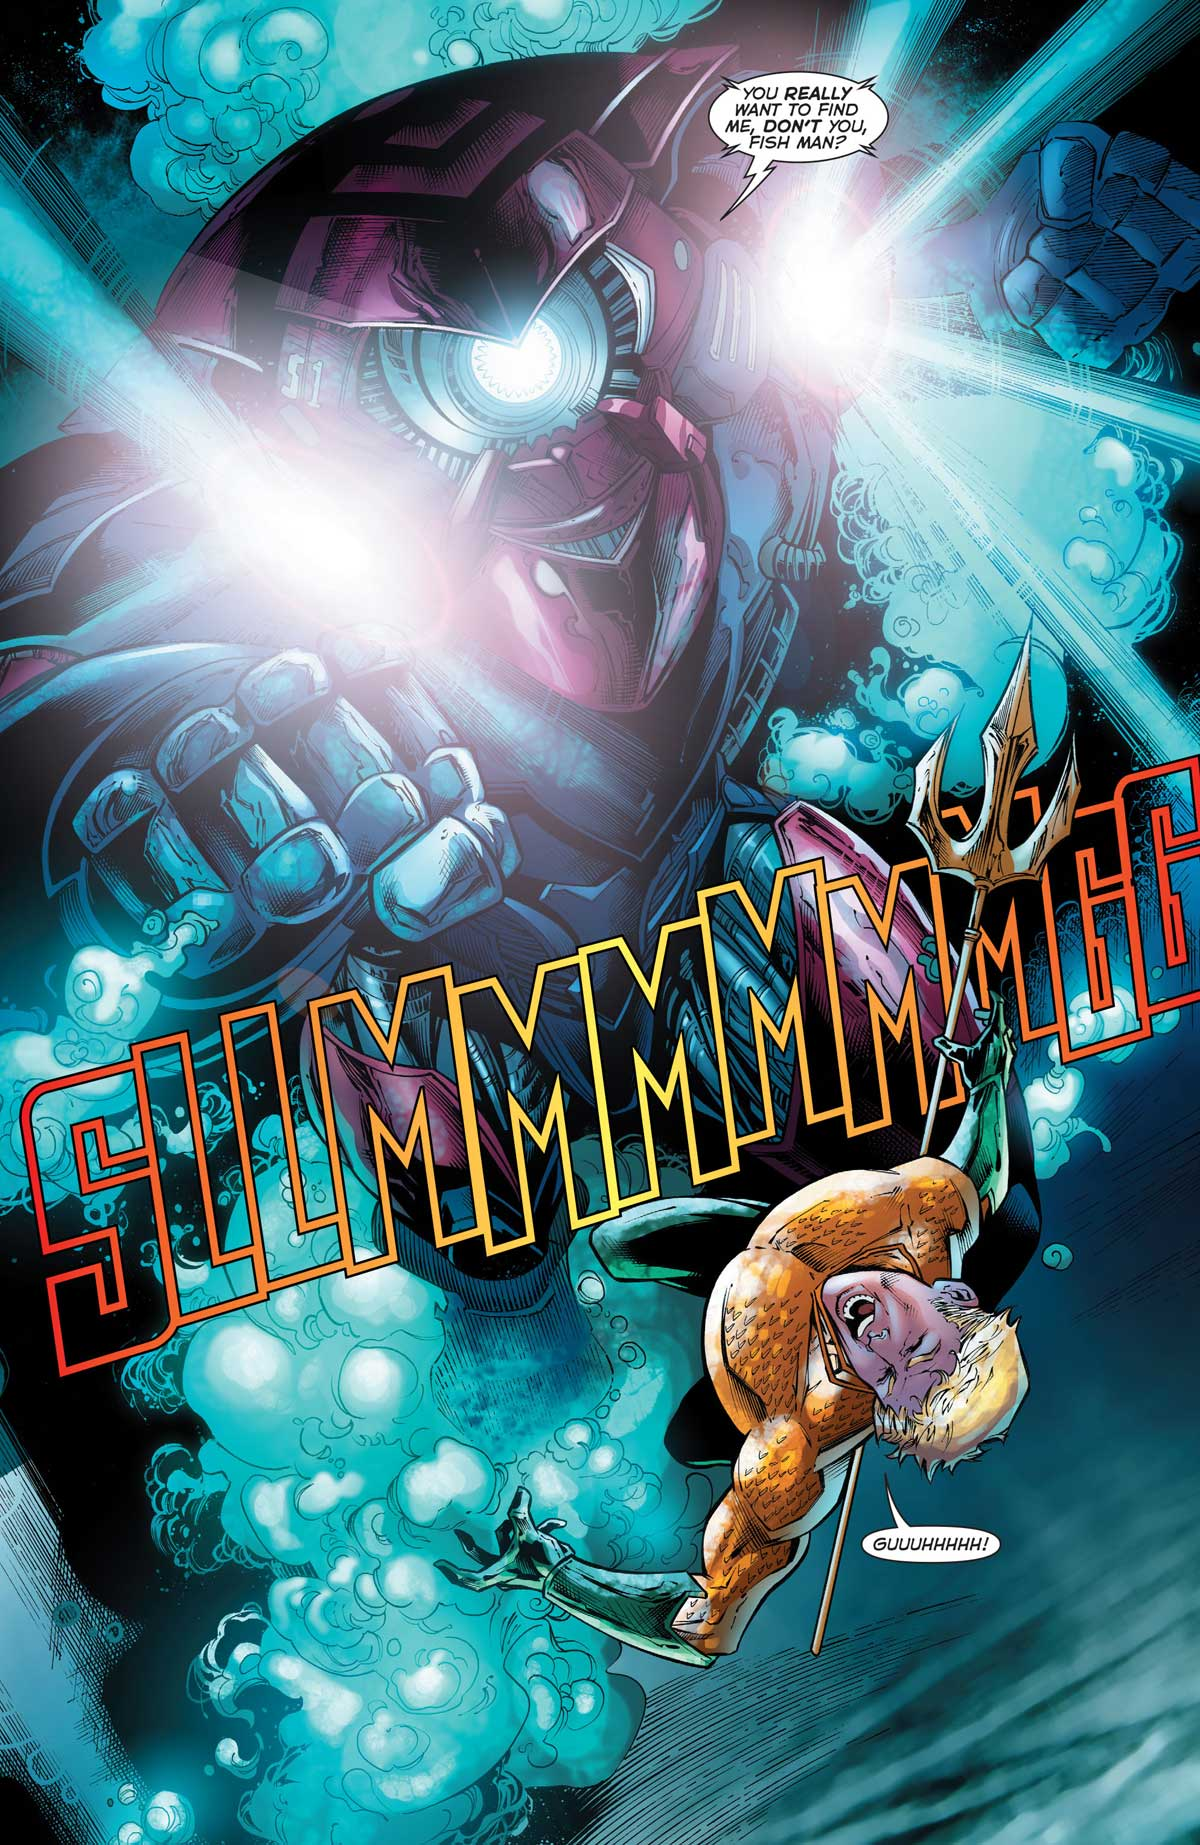 Aquaman #51 by Dan Abnett, Vicente Cifuentes, Juan Castro